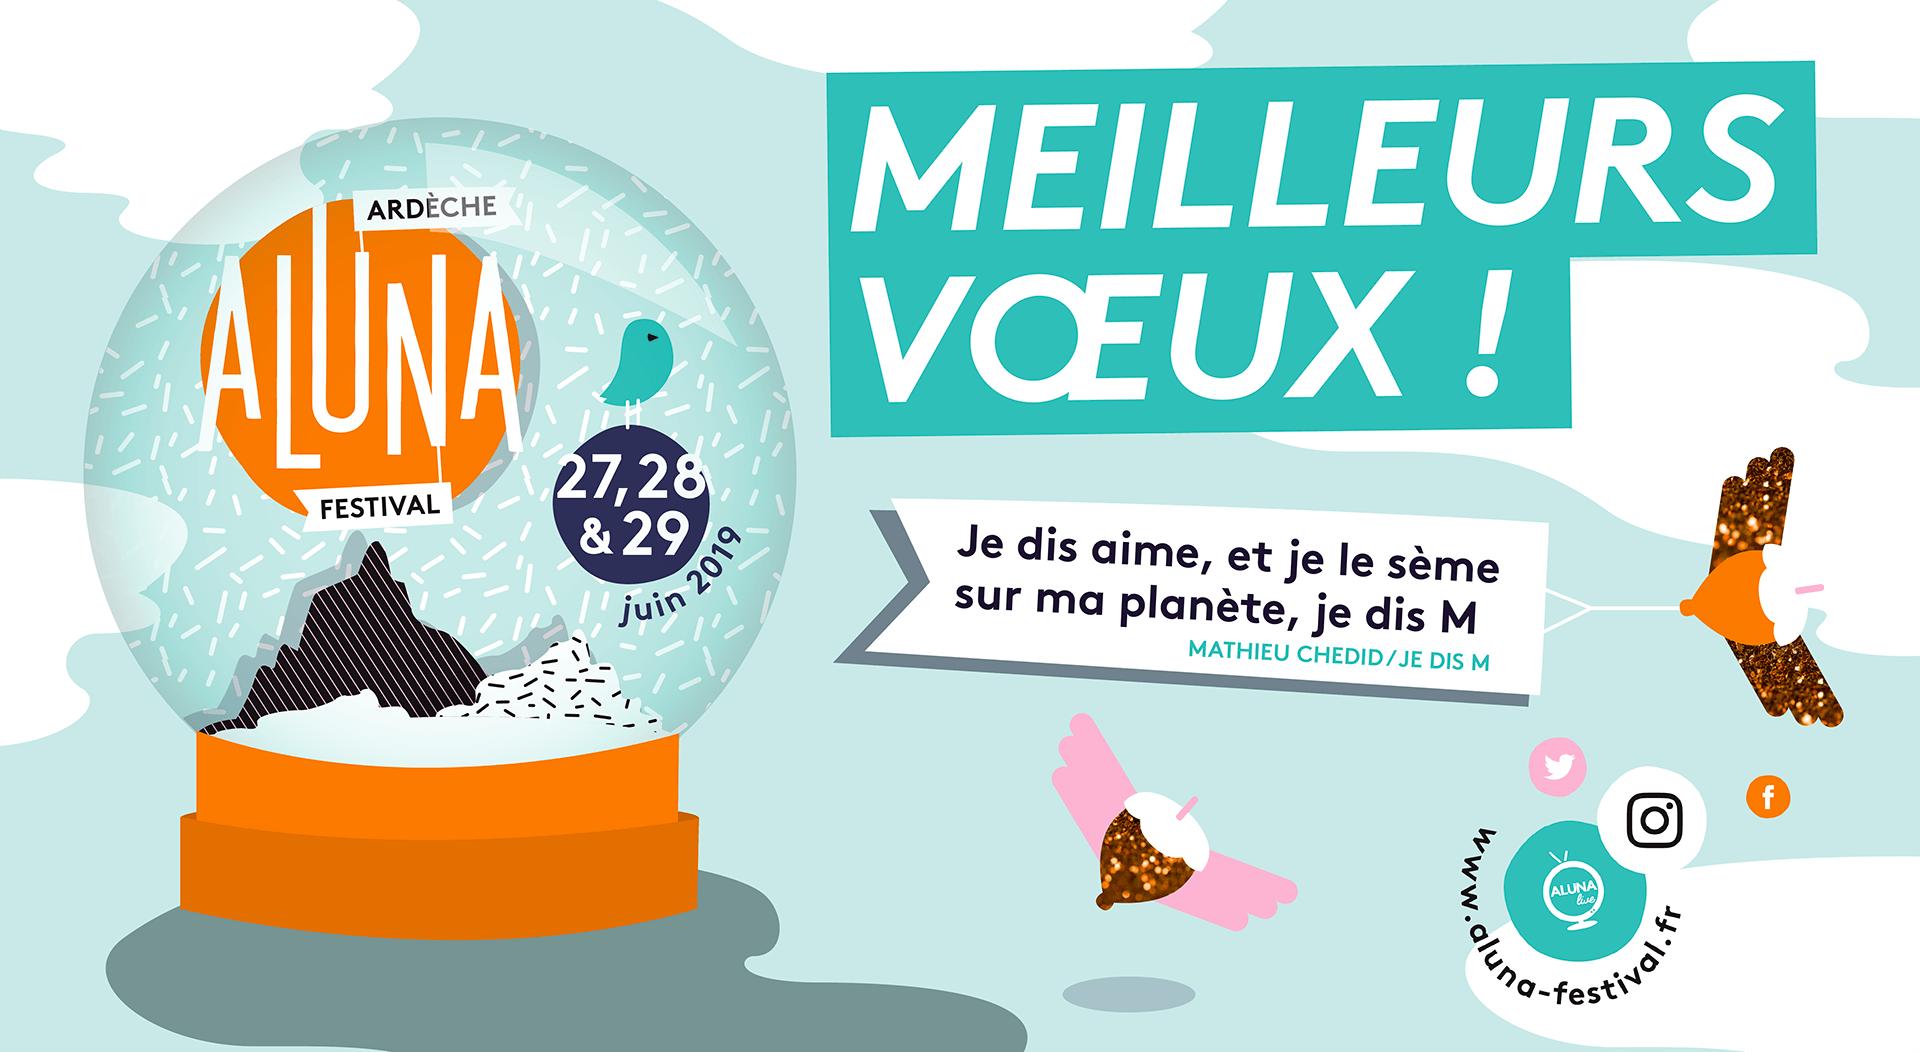 Carte voeux 2019 Ardèche Aluna Festival